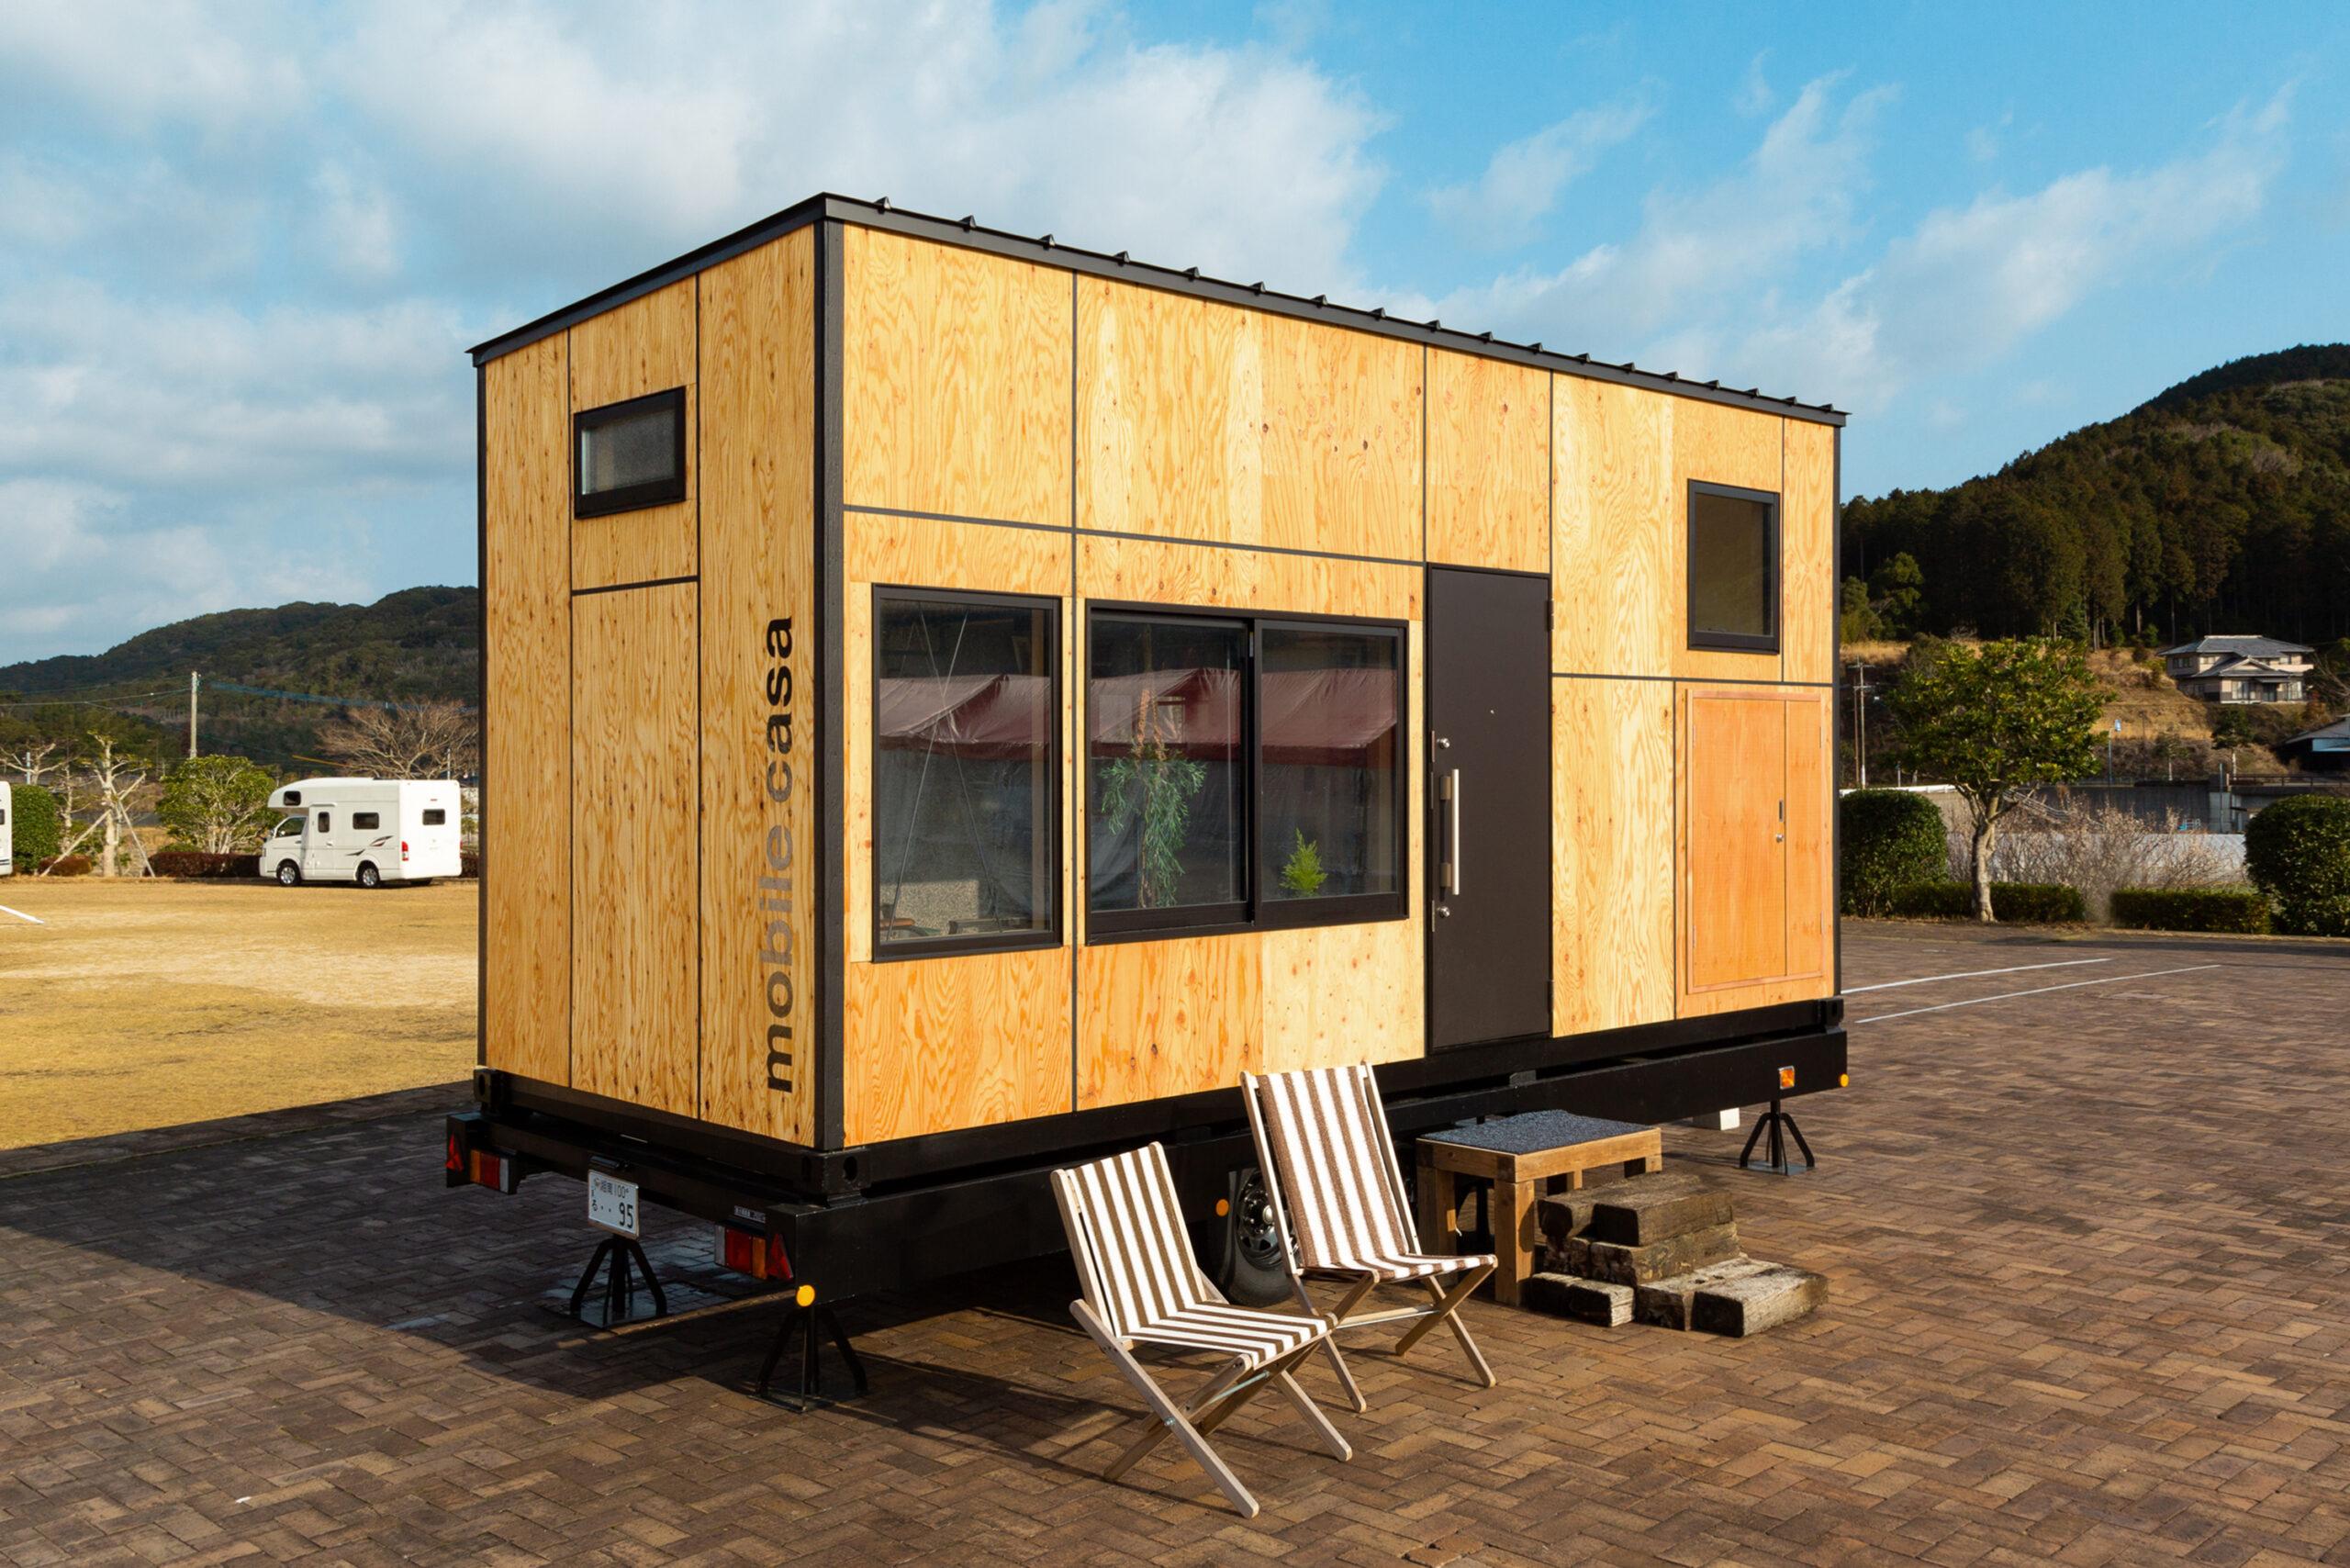 『mobile casa』-最新型トレーラーハウス-